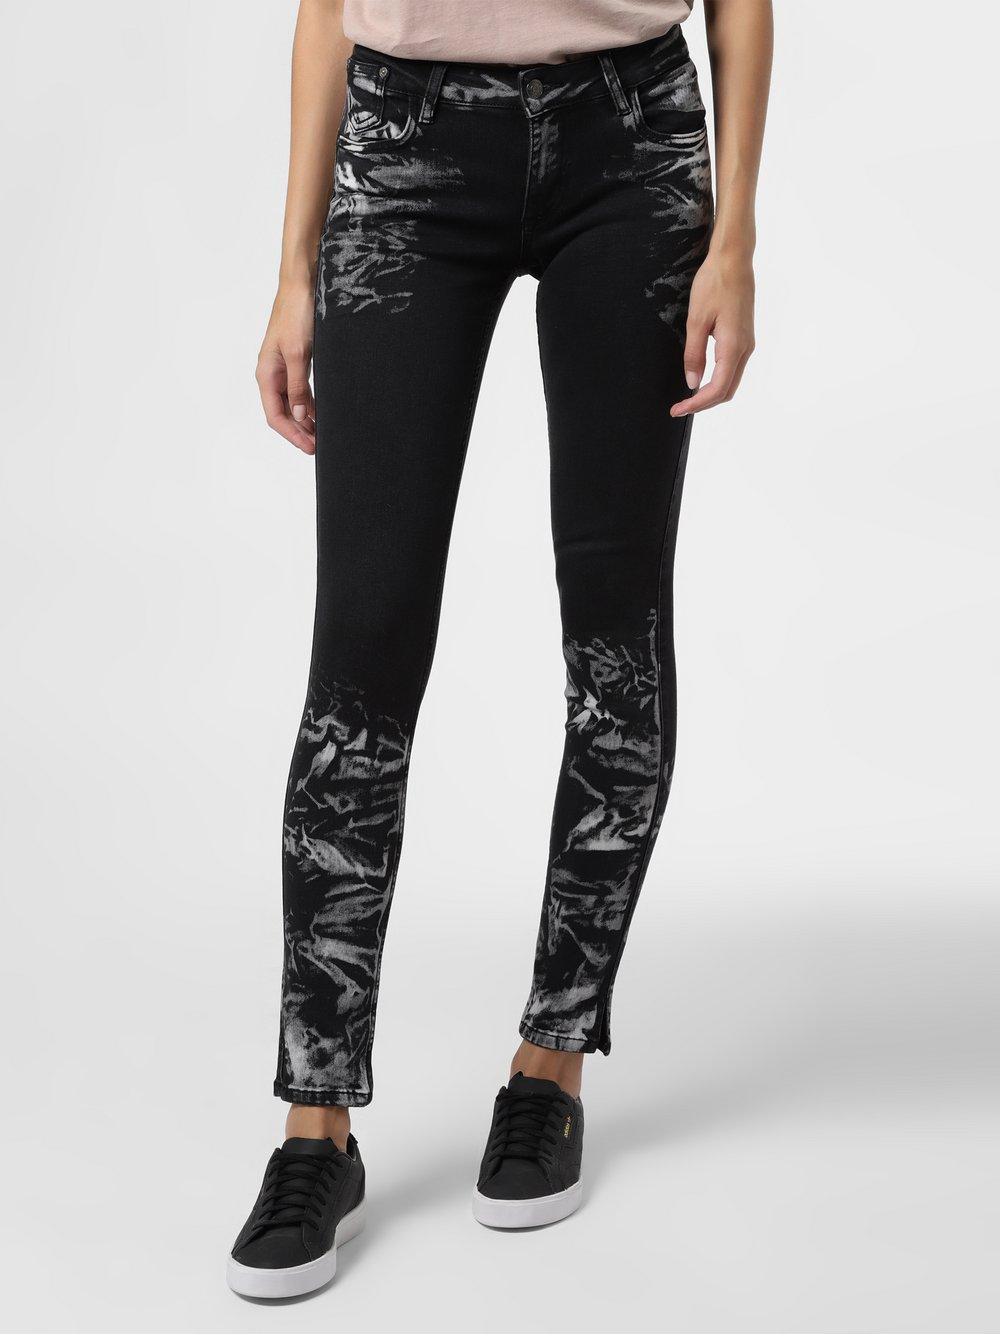 Blue Fire – Spodnie damskie – Chloe, czarny Van Graaf 481433-0001-03231